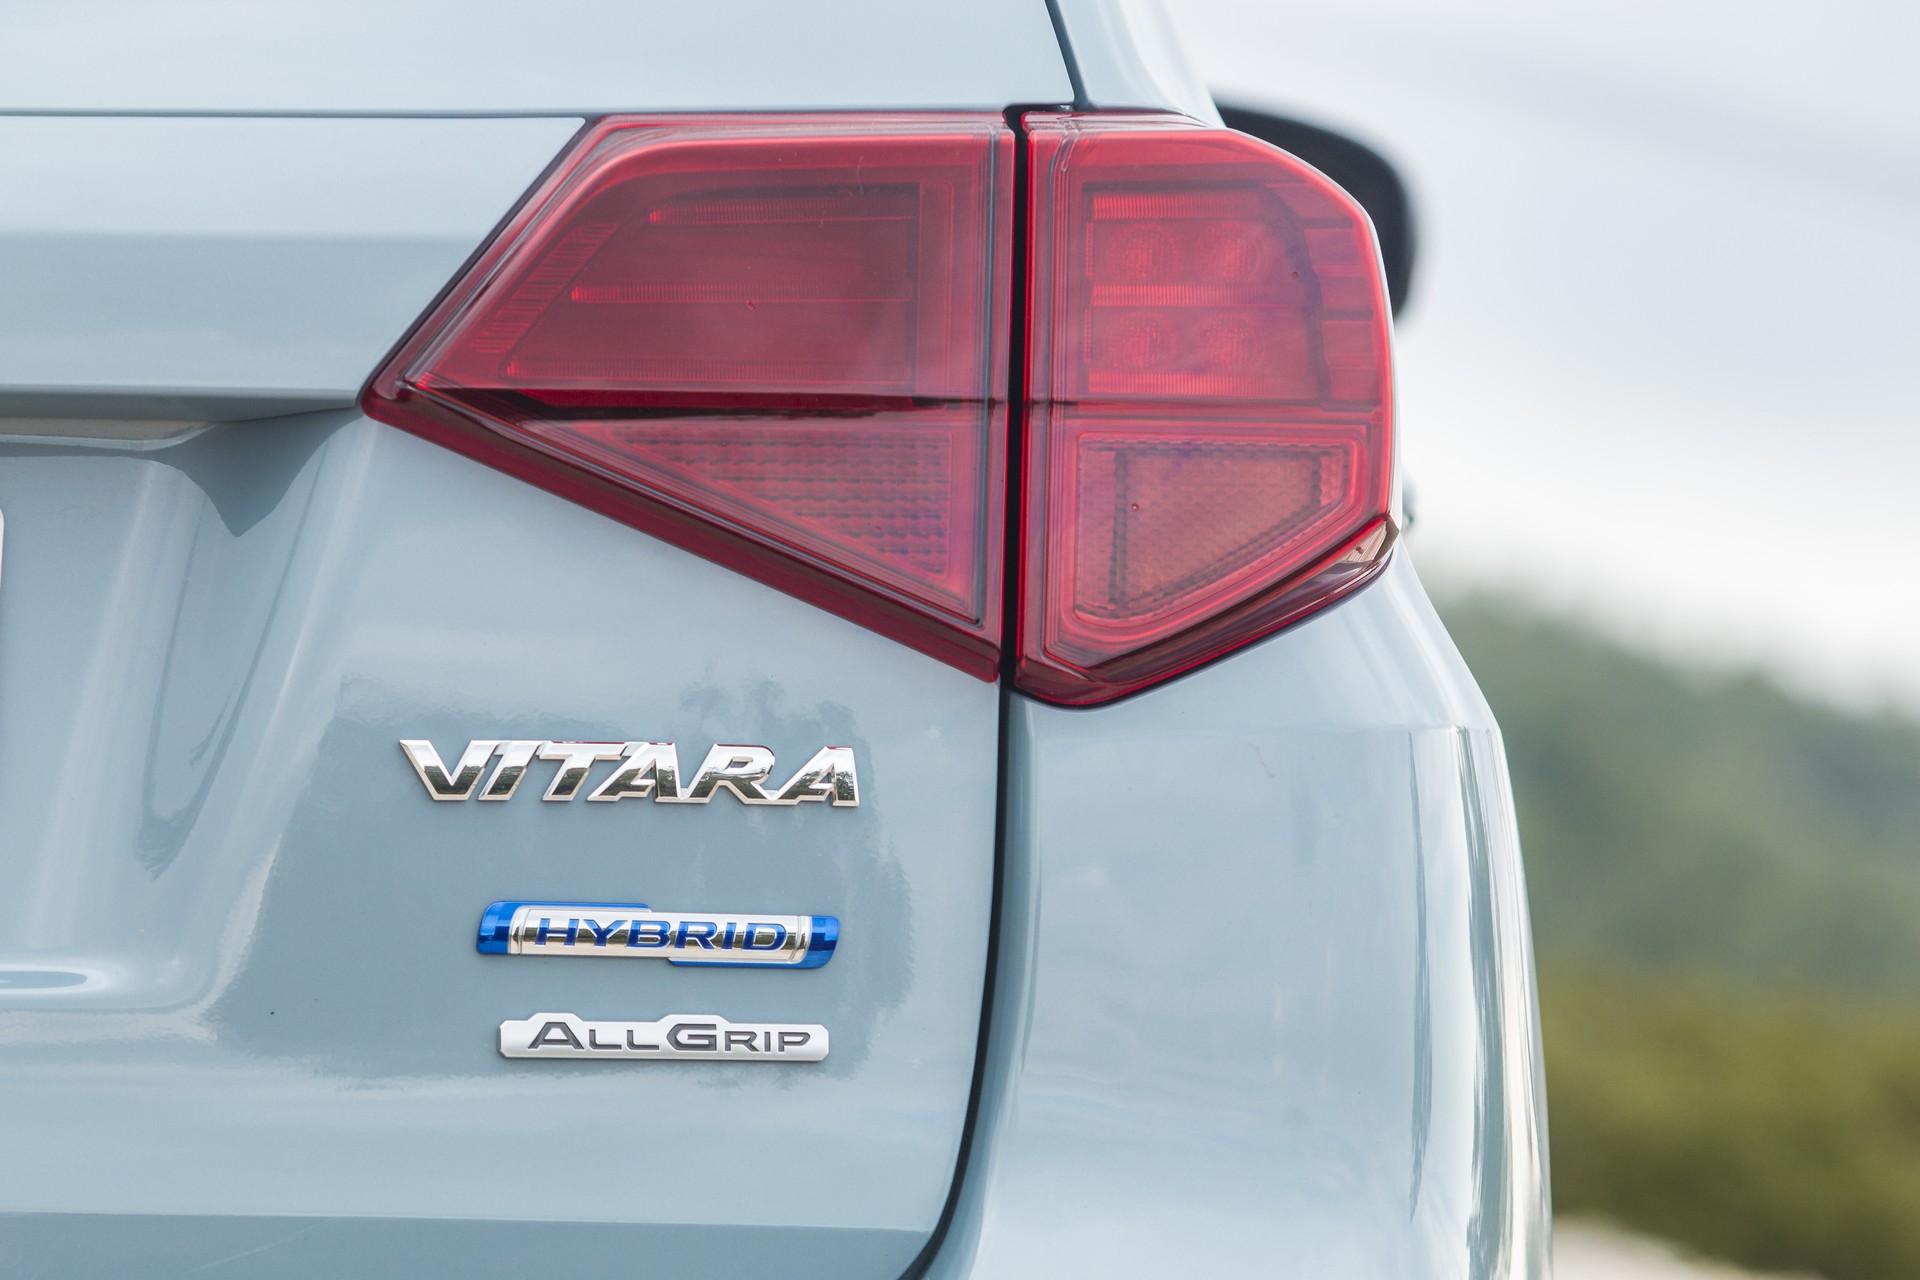 Suzuki Vitara 1.4 Boosterjet Hybrid AllGrip